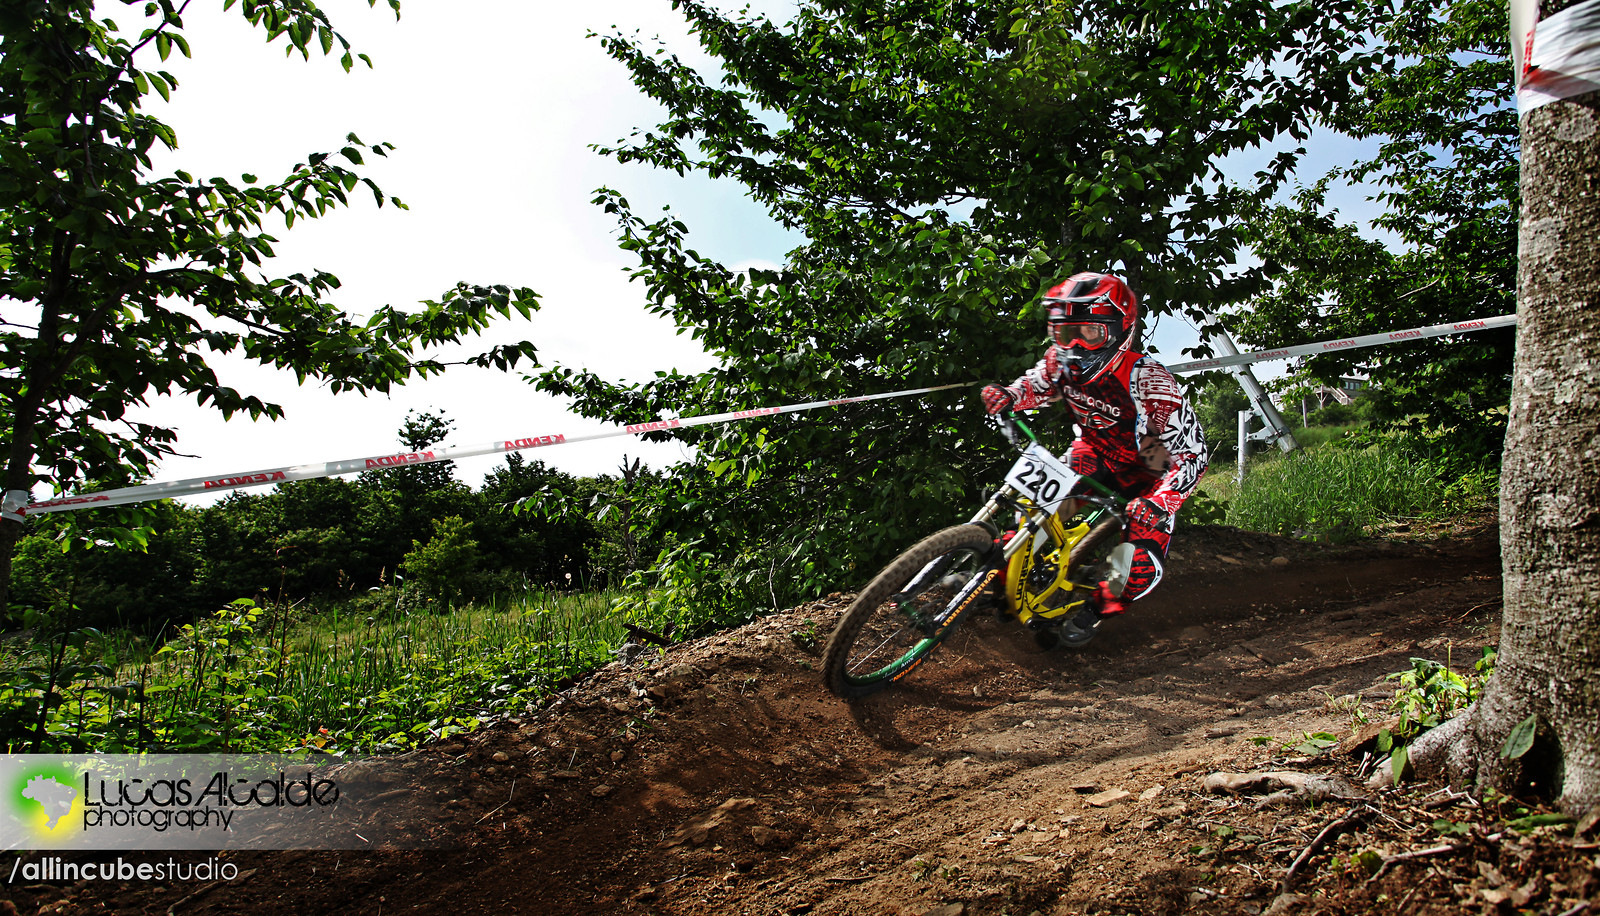 Josh Standish - Lucas_Alcalde - Mountain Biking Pictures - Vital MTB